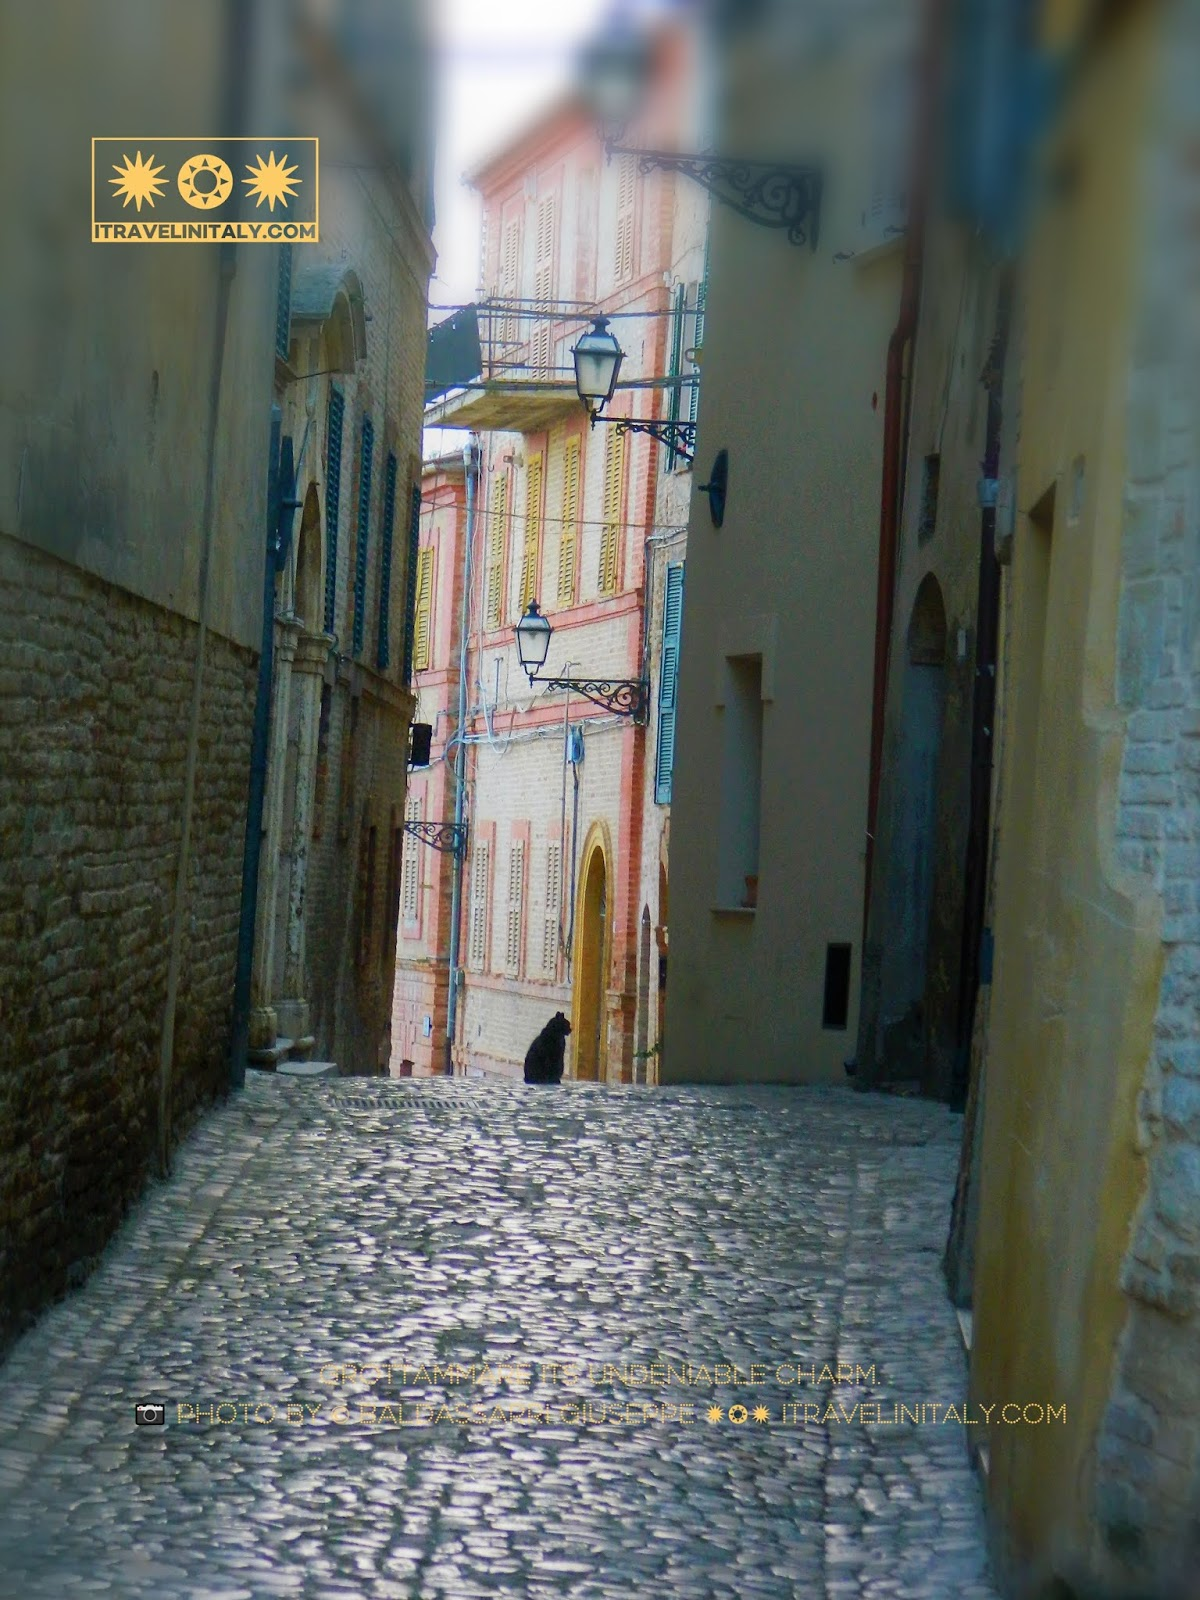 Grottammare its undeniable charm. 📷 photo By © Baldassarri Giuseppe ✹❂✹ itravelinitaly.com Travel is the traveler in Italy